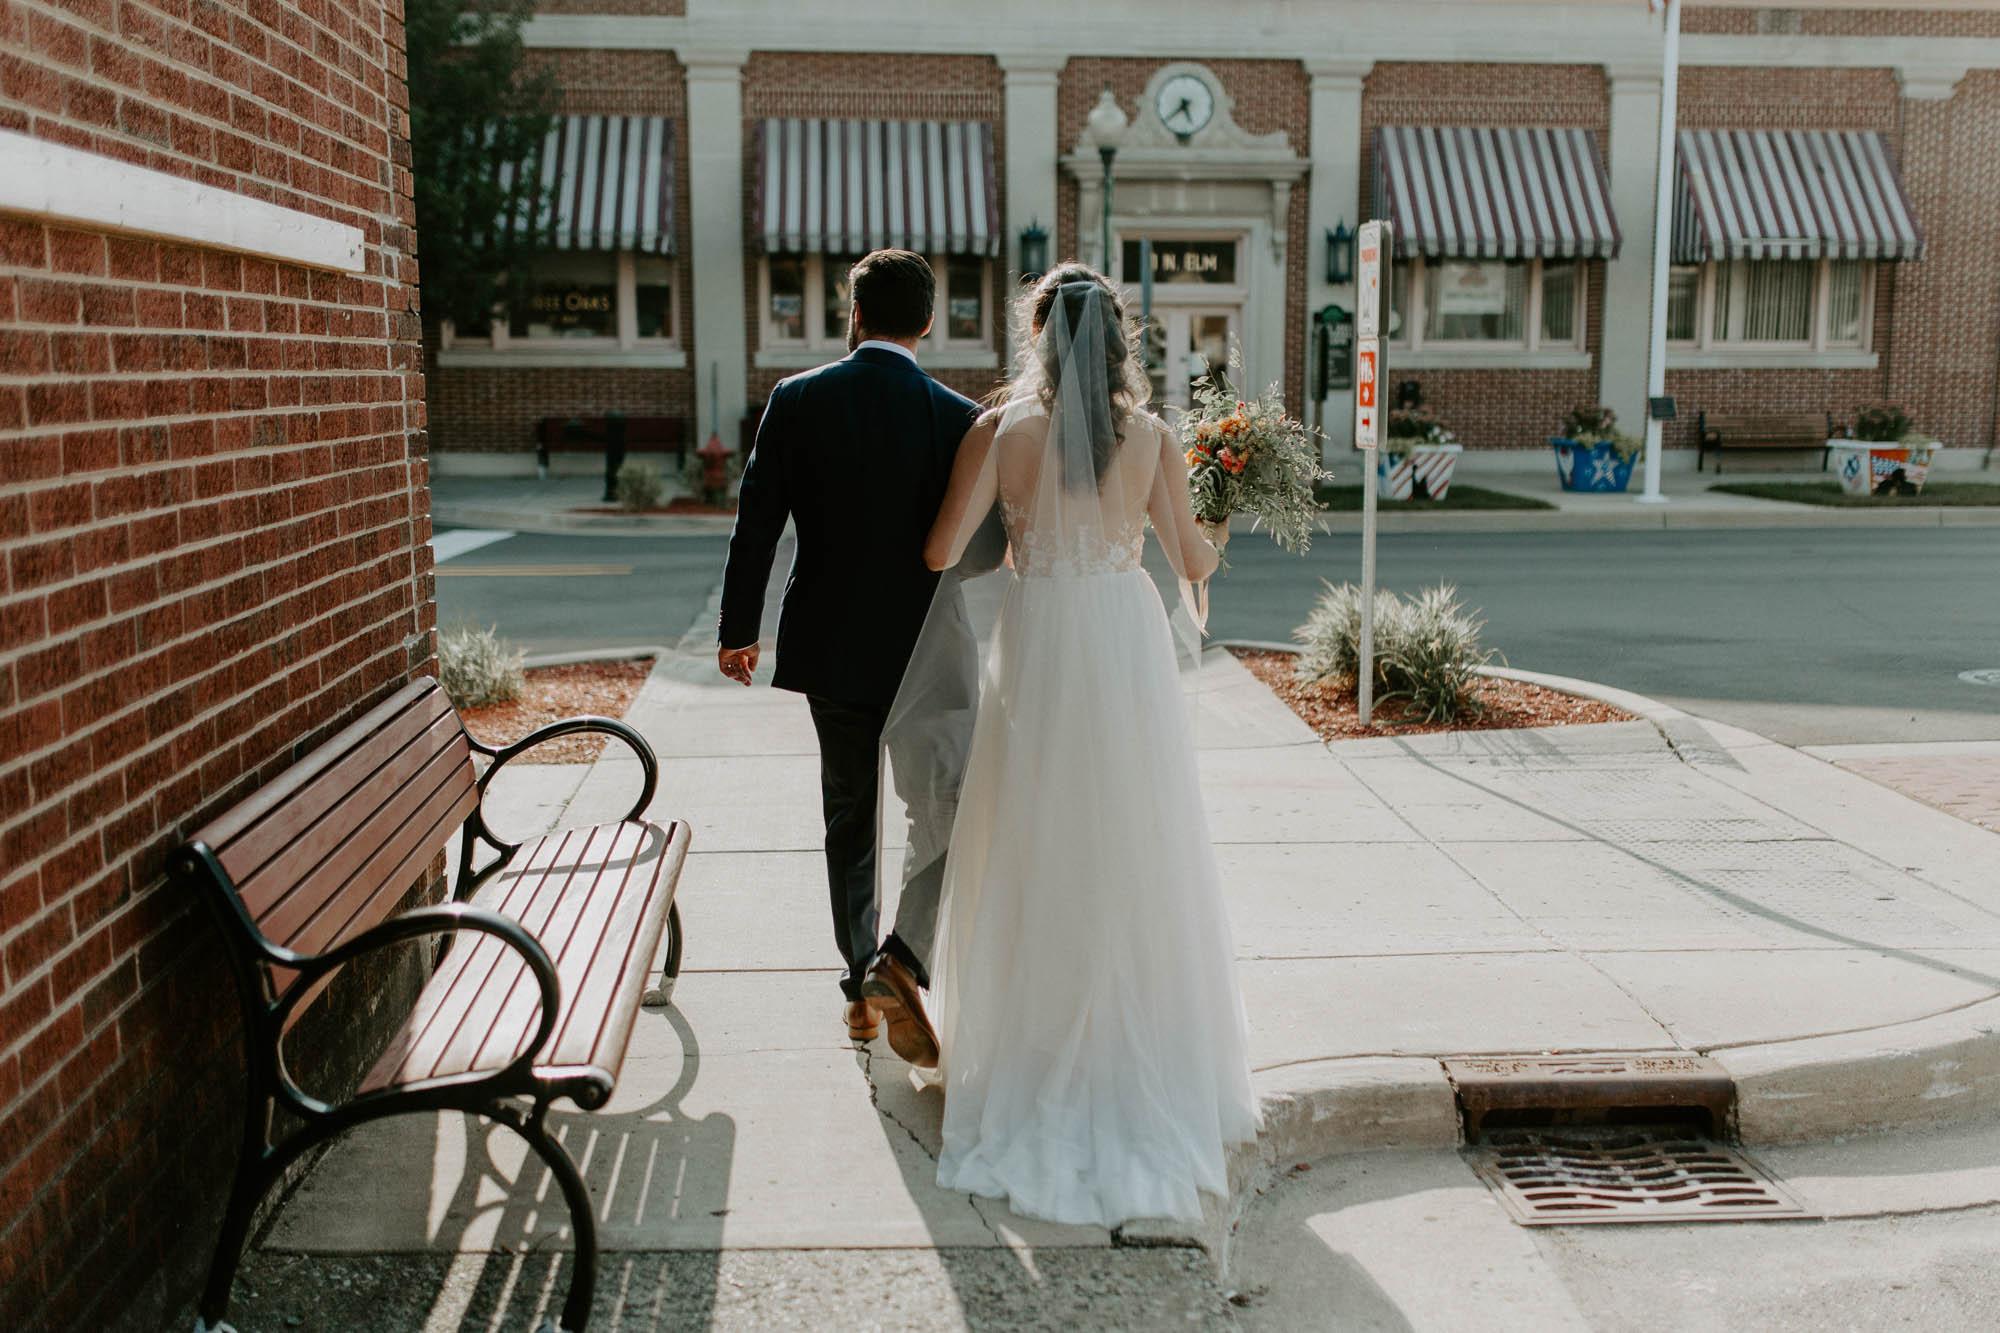 journeyman_distillery_wedding_photographer_chicago_il_wright_photographs-3934.jpg